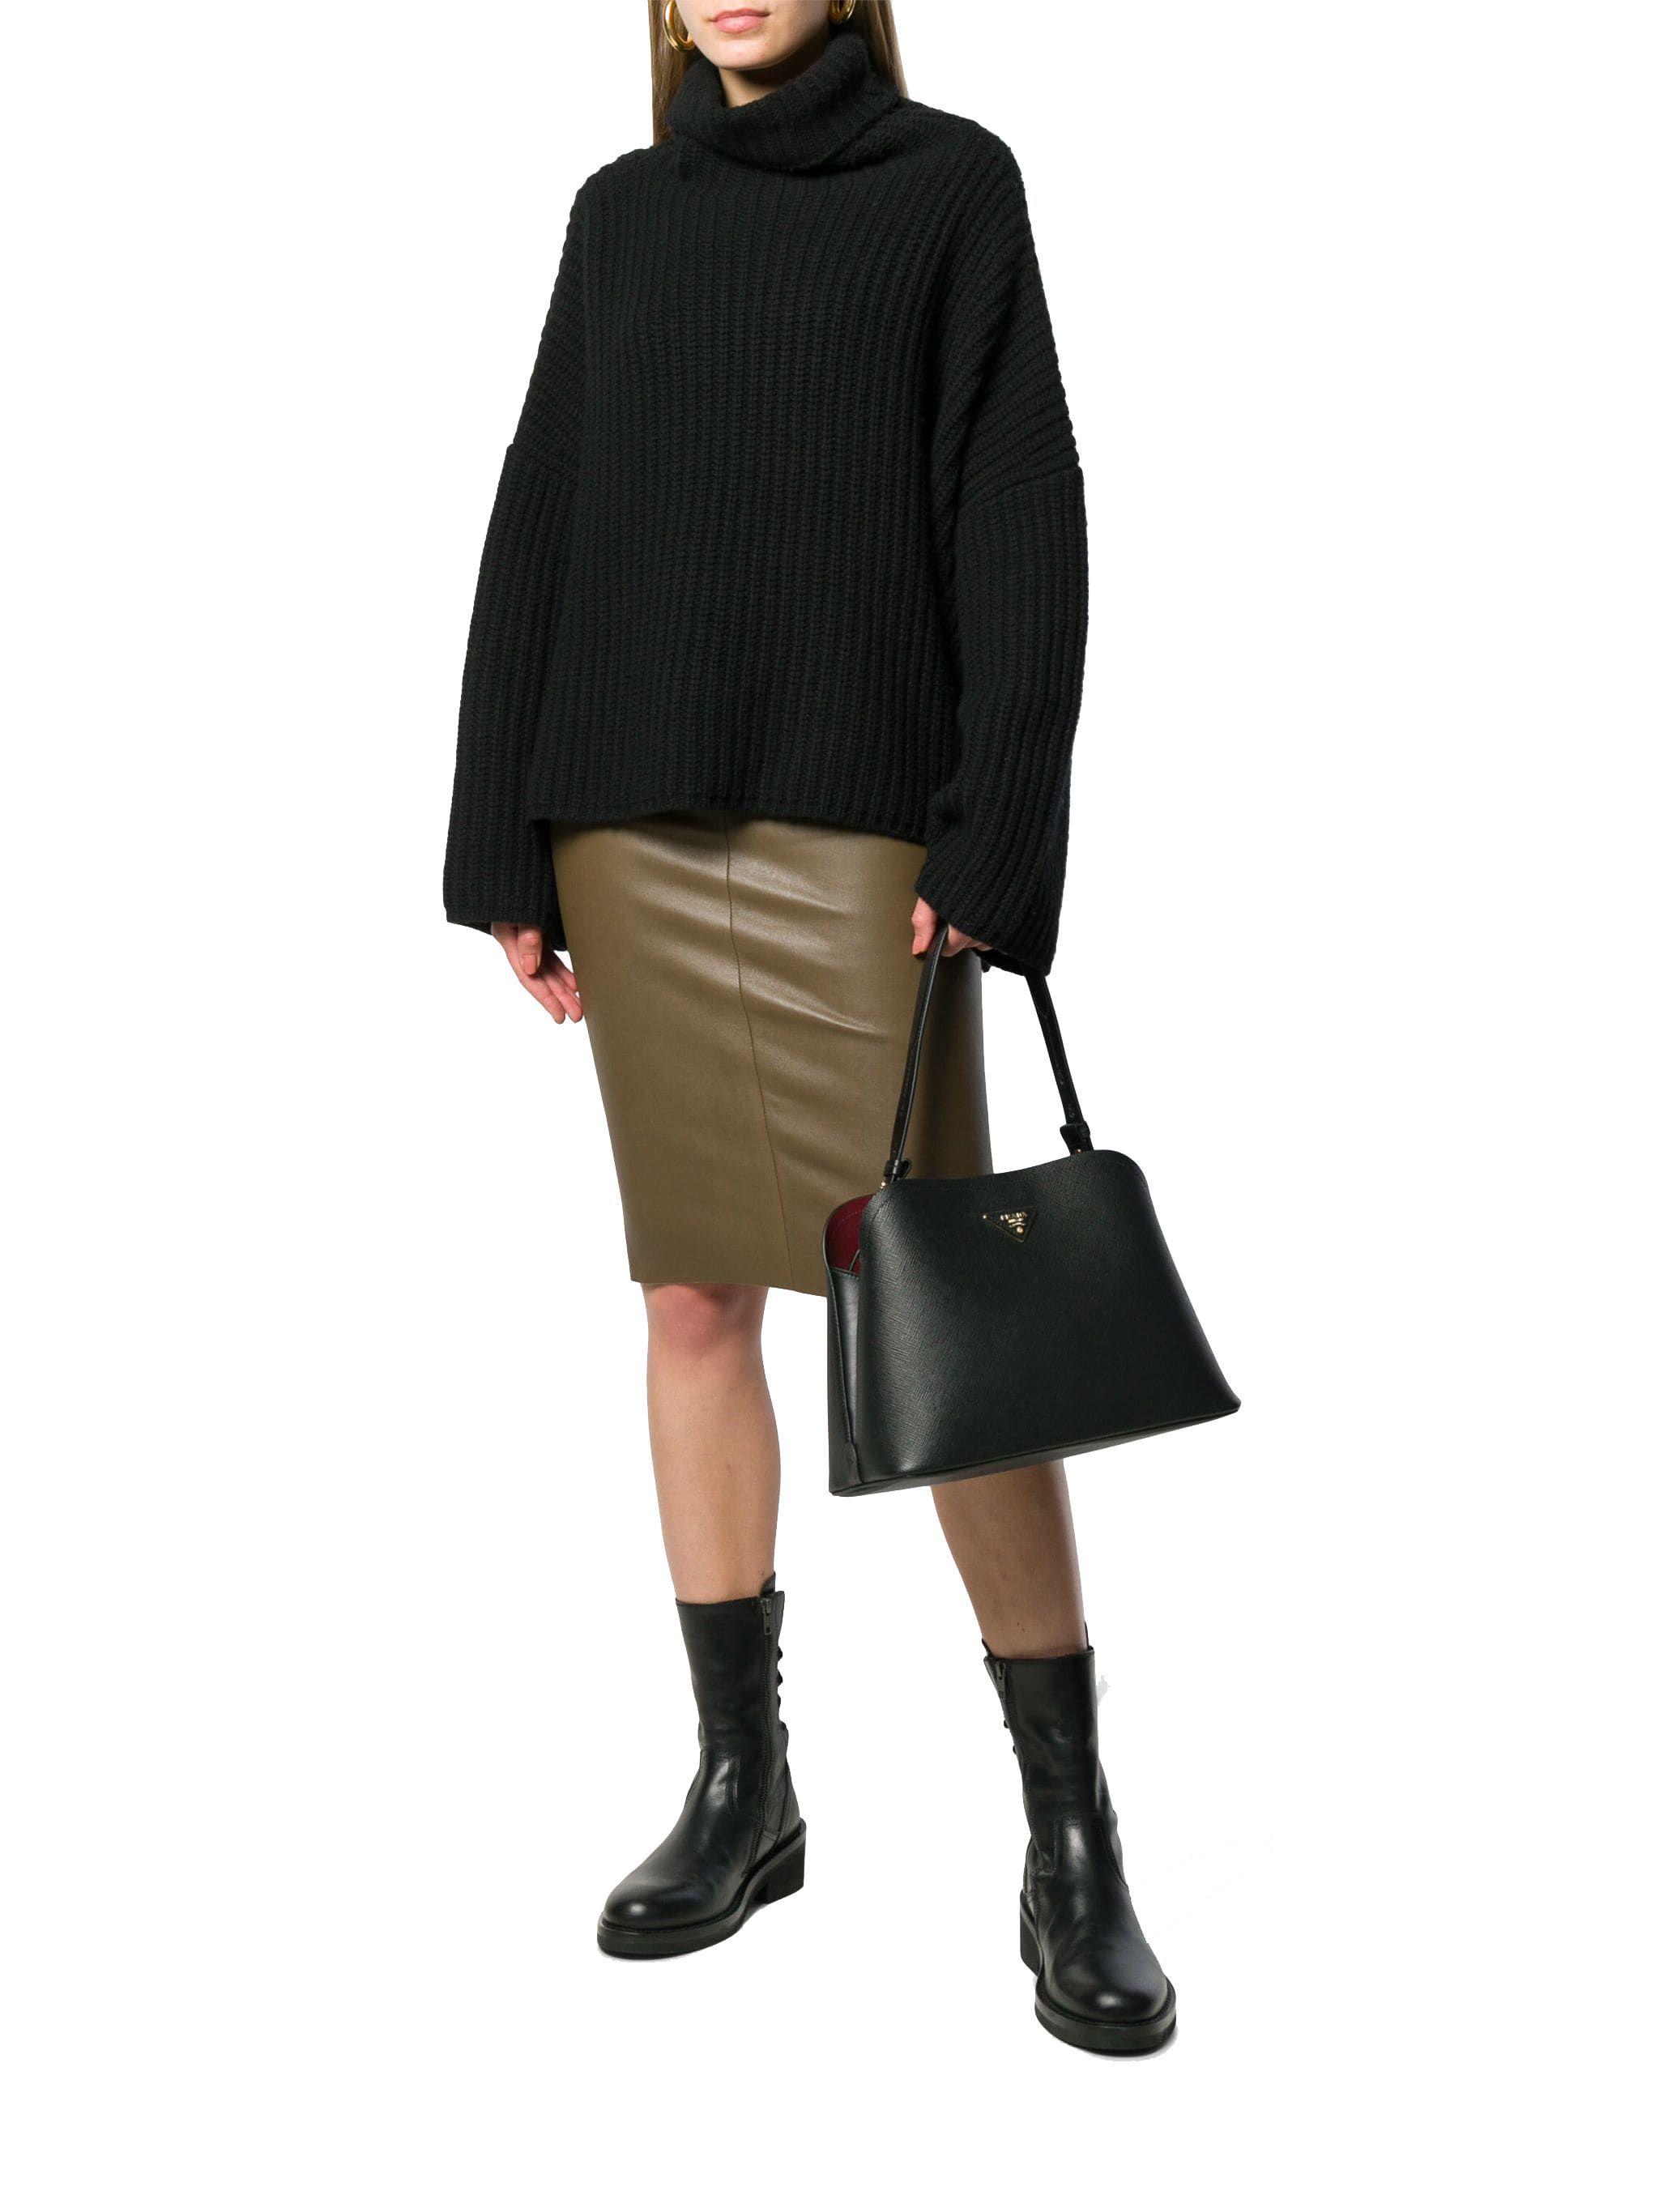 PRADA WOMEN'S 1BA251VOOO2ERXF0ME5 BLACK LEATHER SHOULDER BAG